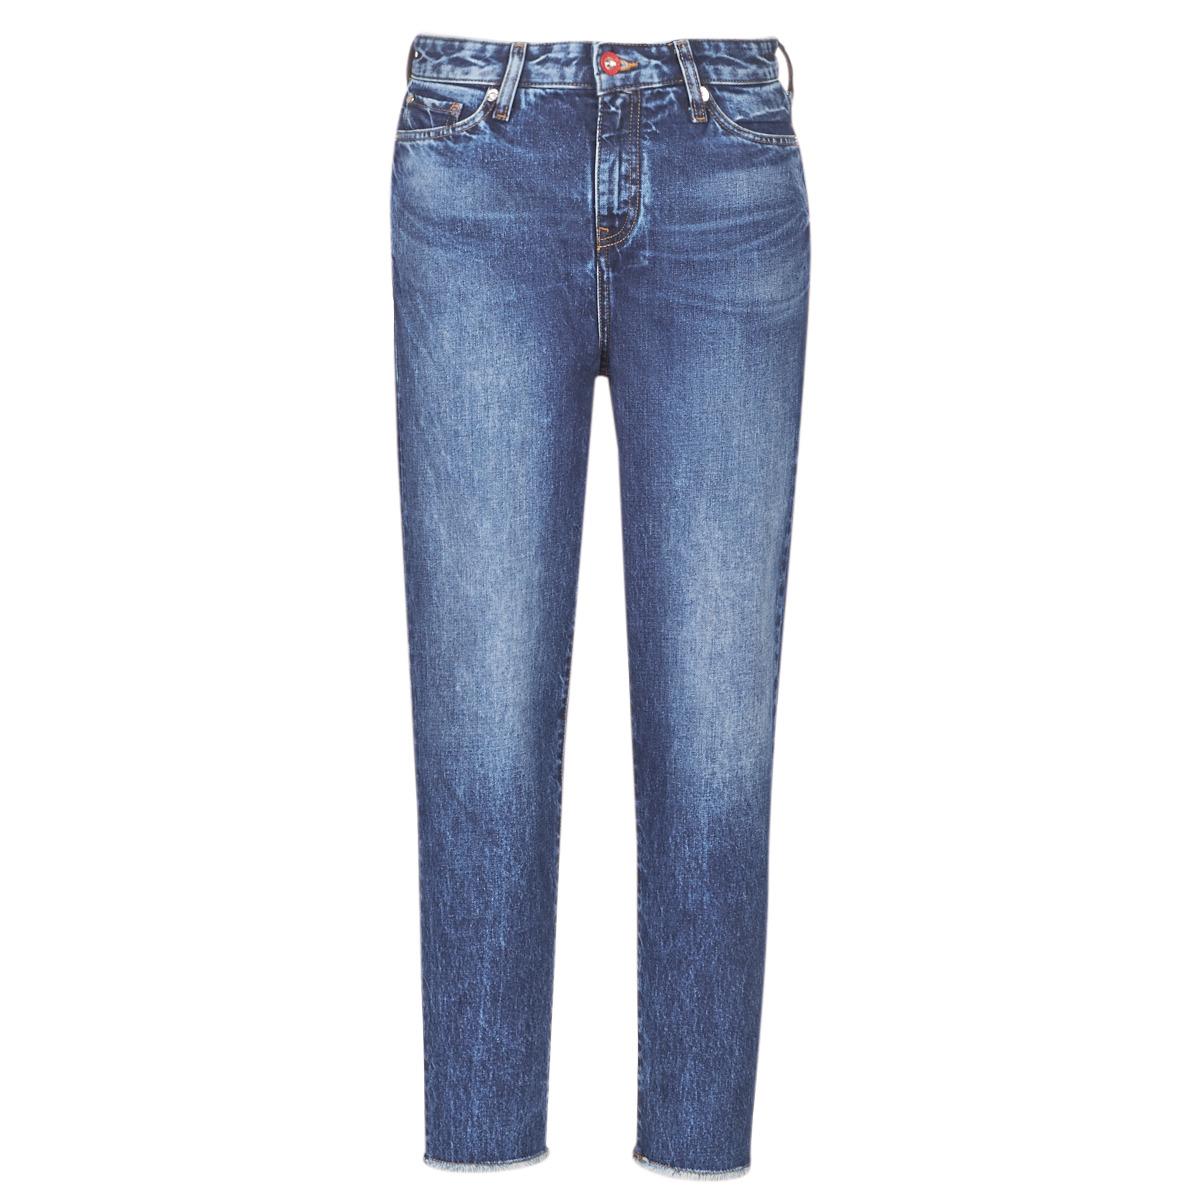 Jeans - boyfriend Armani Exchange  6GYJ16-Y2MHZ-1502